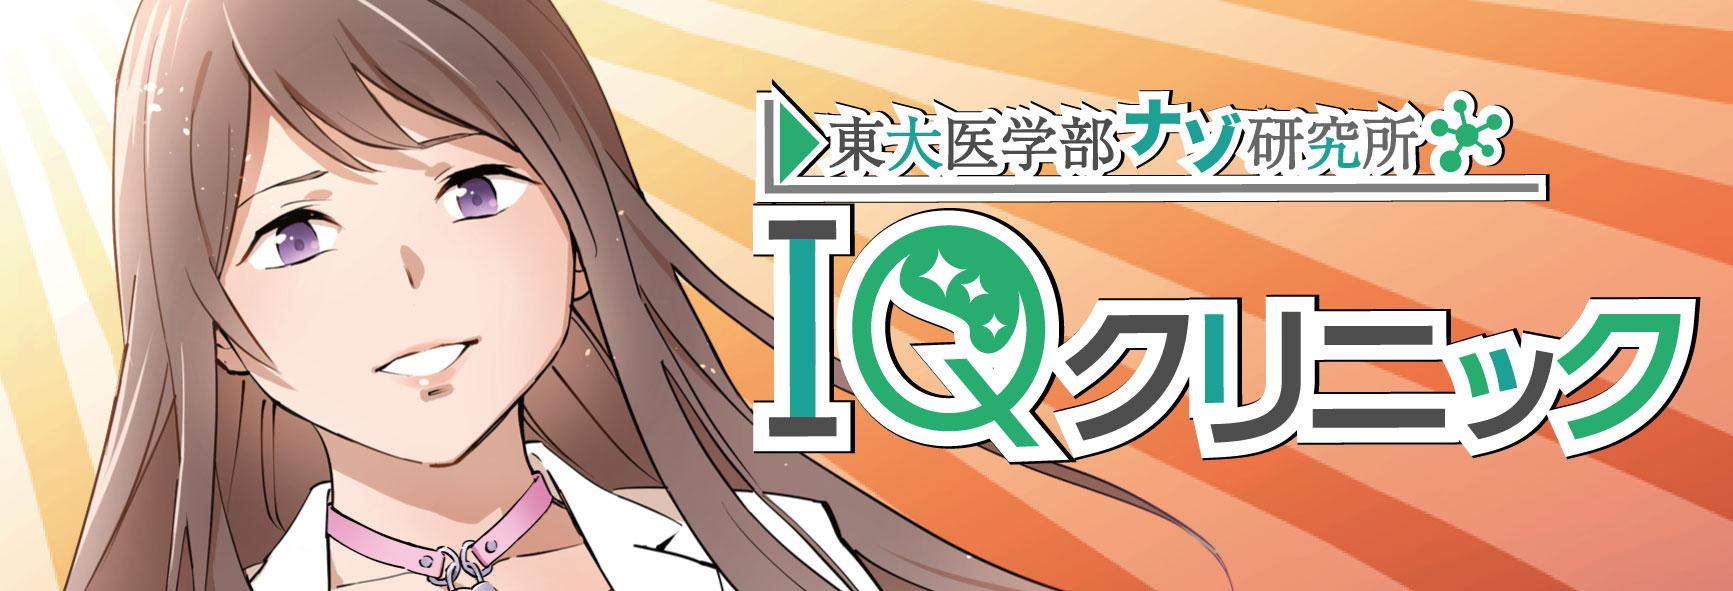 IQクリニック〜東大医学部ナゾ研究所